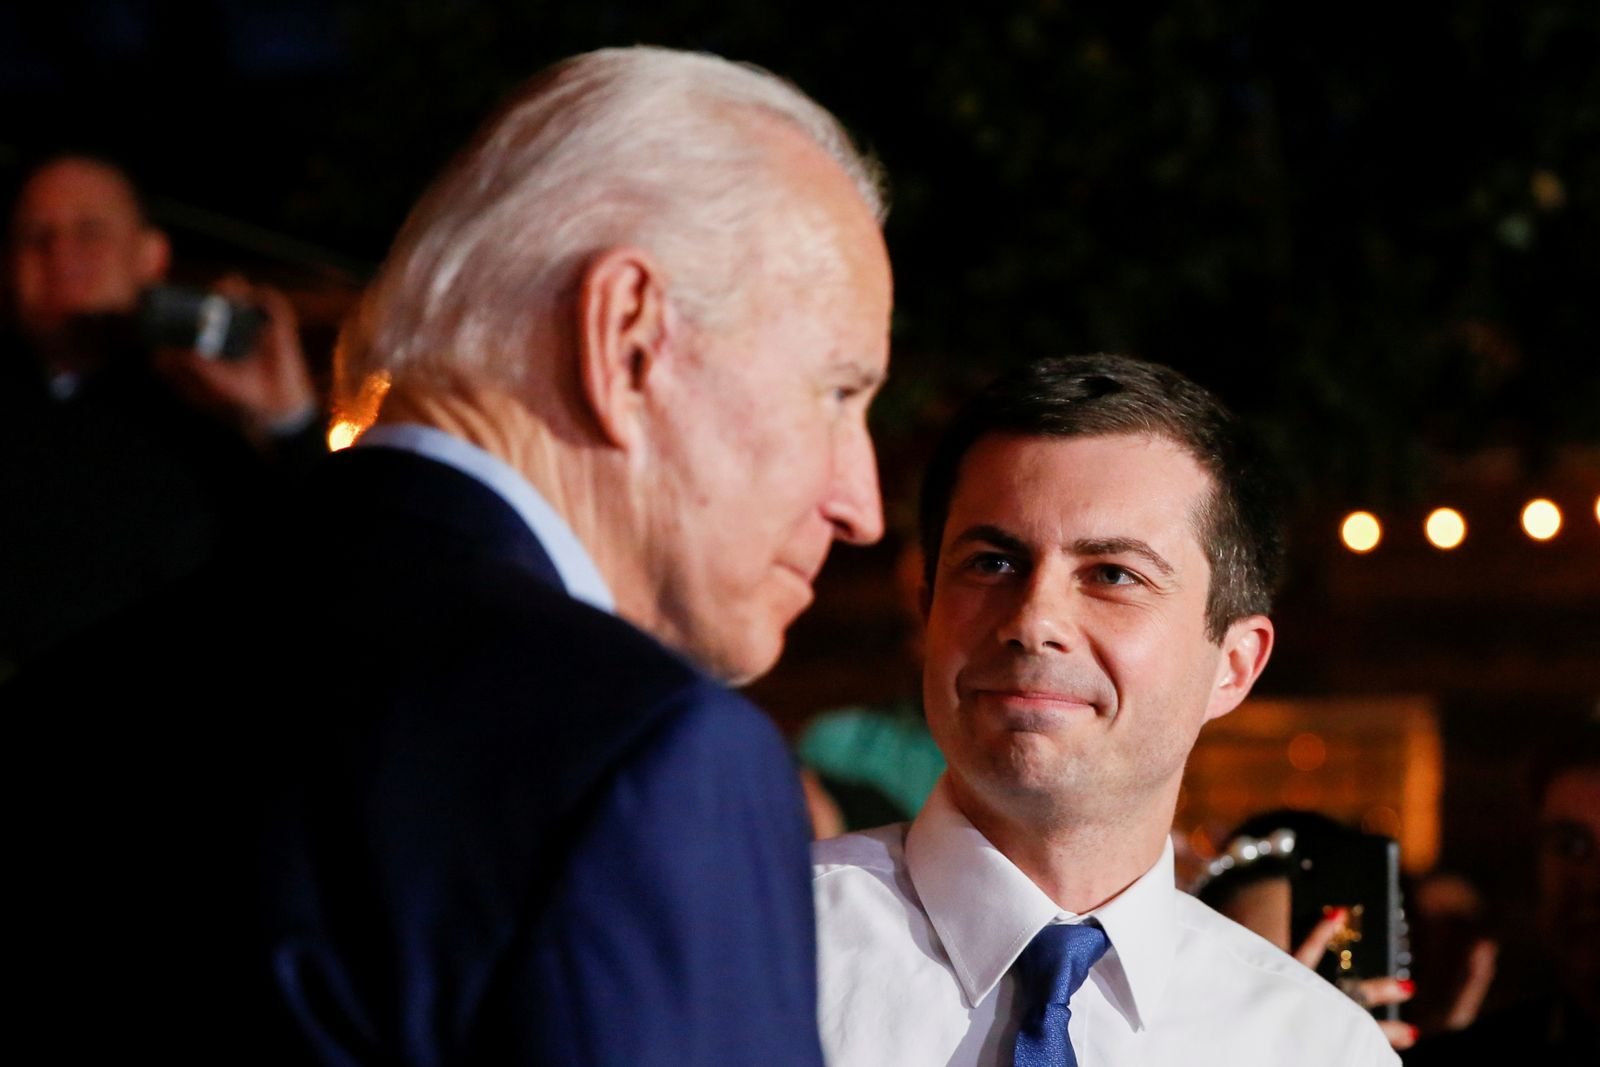 FILE PHOTO: Former Democratic presidential candidate Pete Buttigieg endorses former U.S. Vice President Joe Biden at Chicken Scratch in Dallas